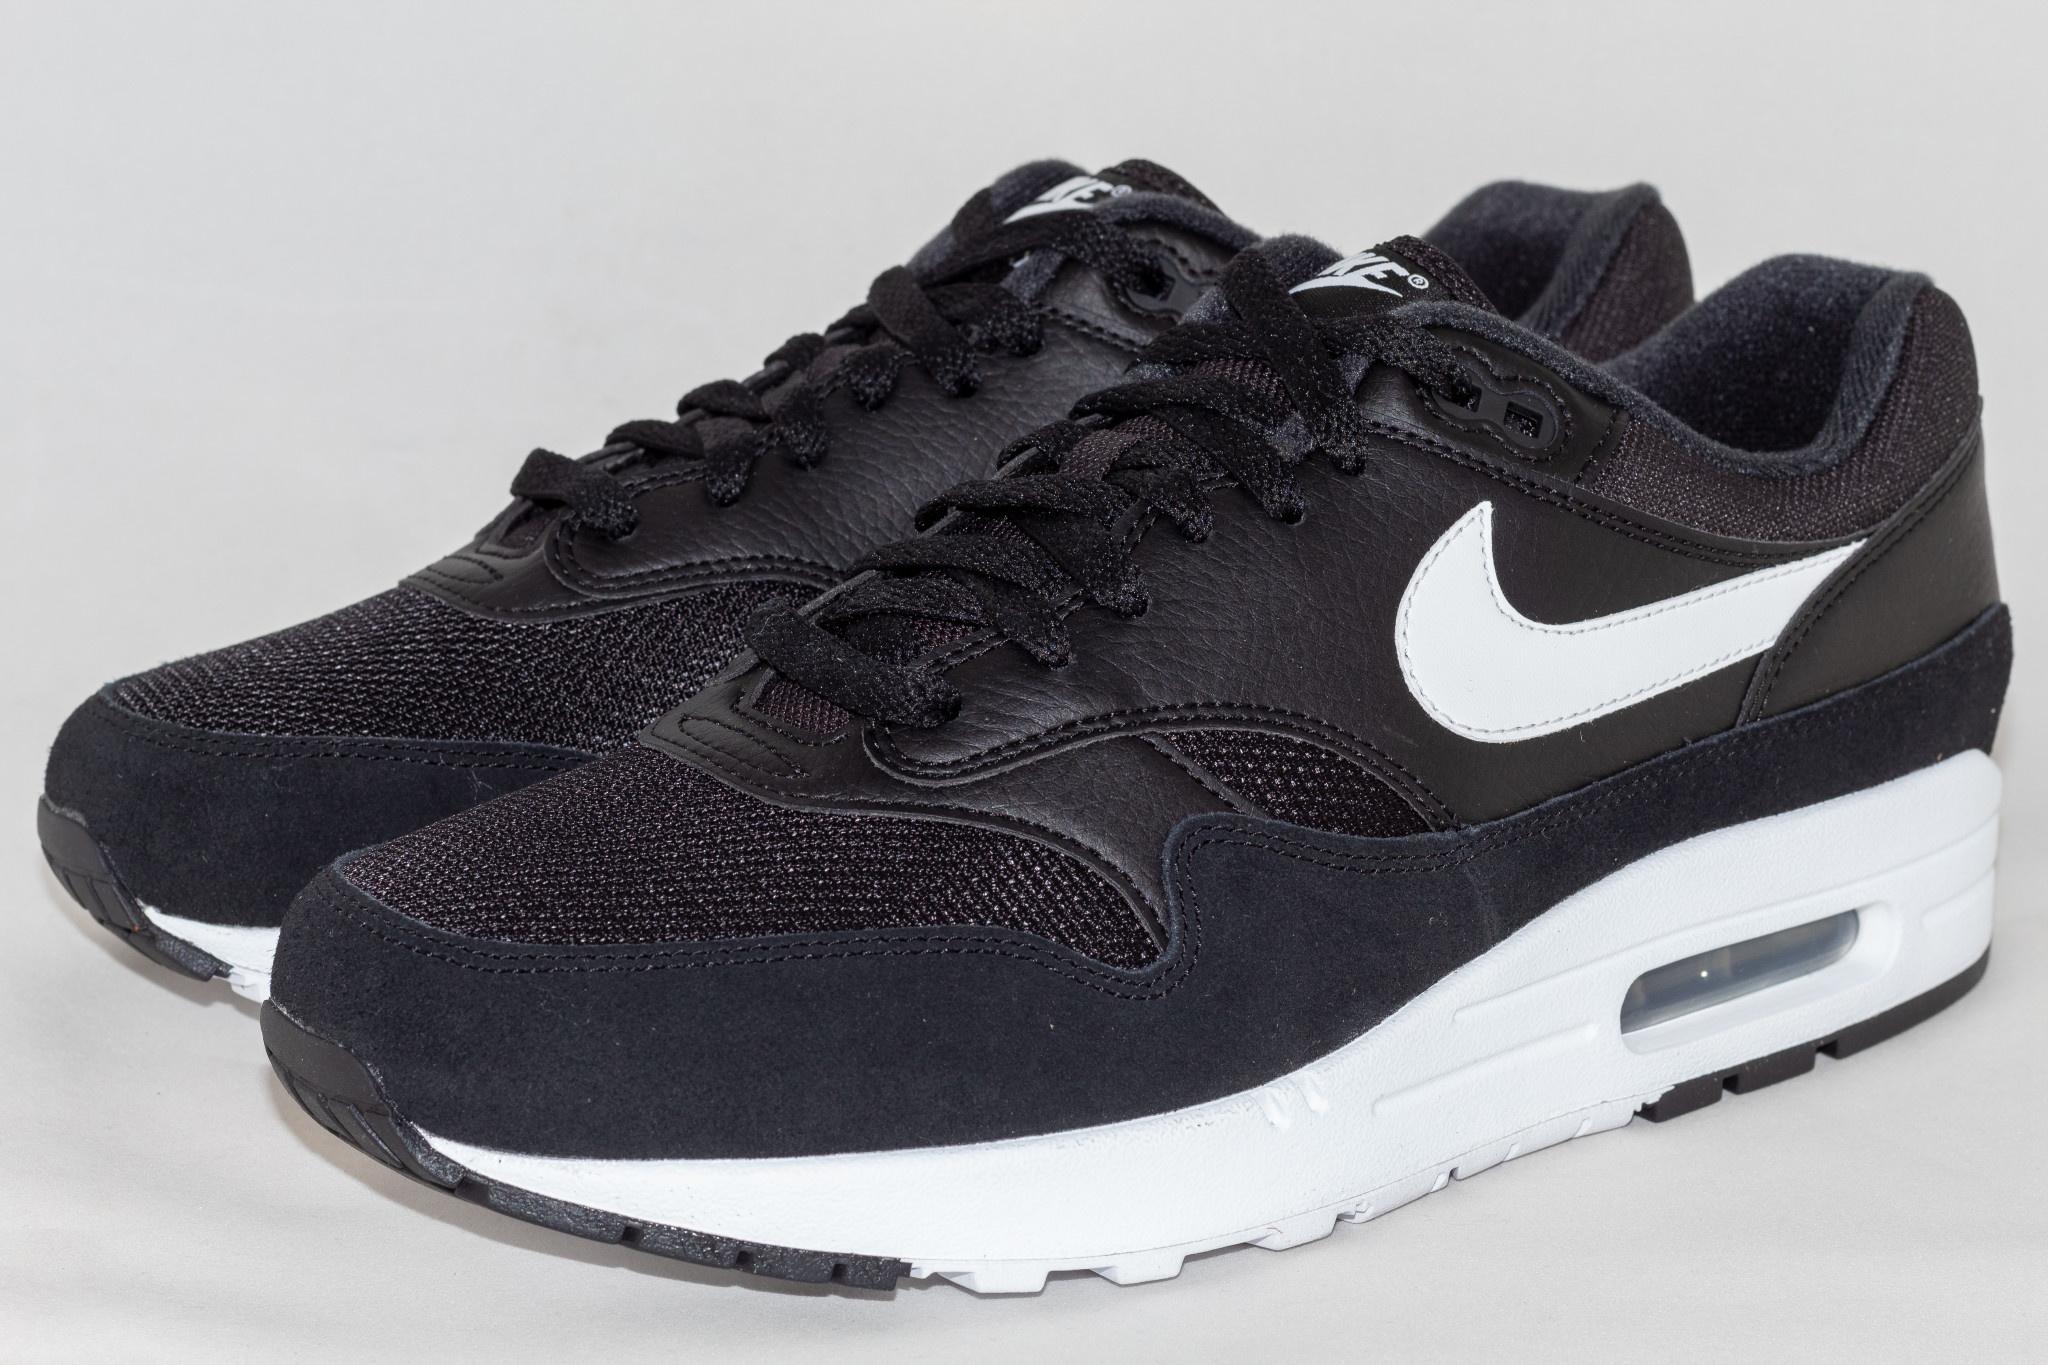 Nike NIKE AIR MAX 1 Black/ White